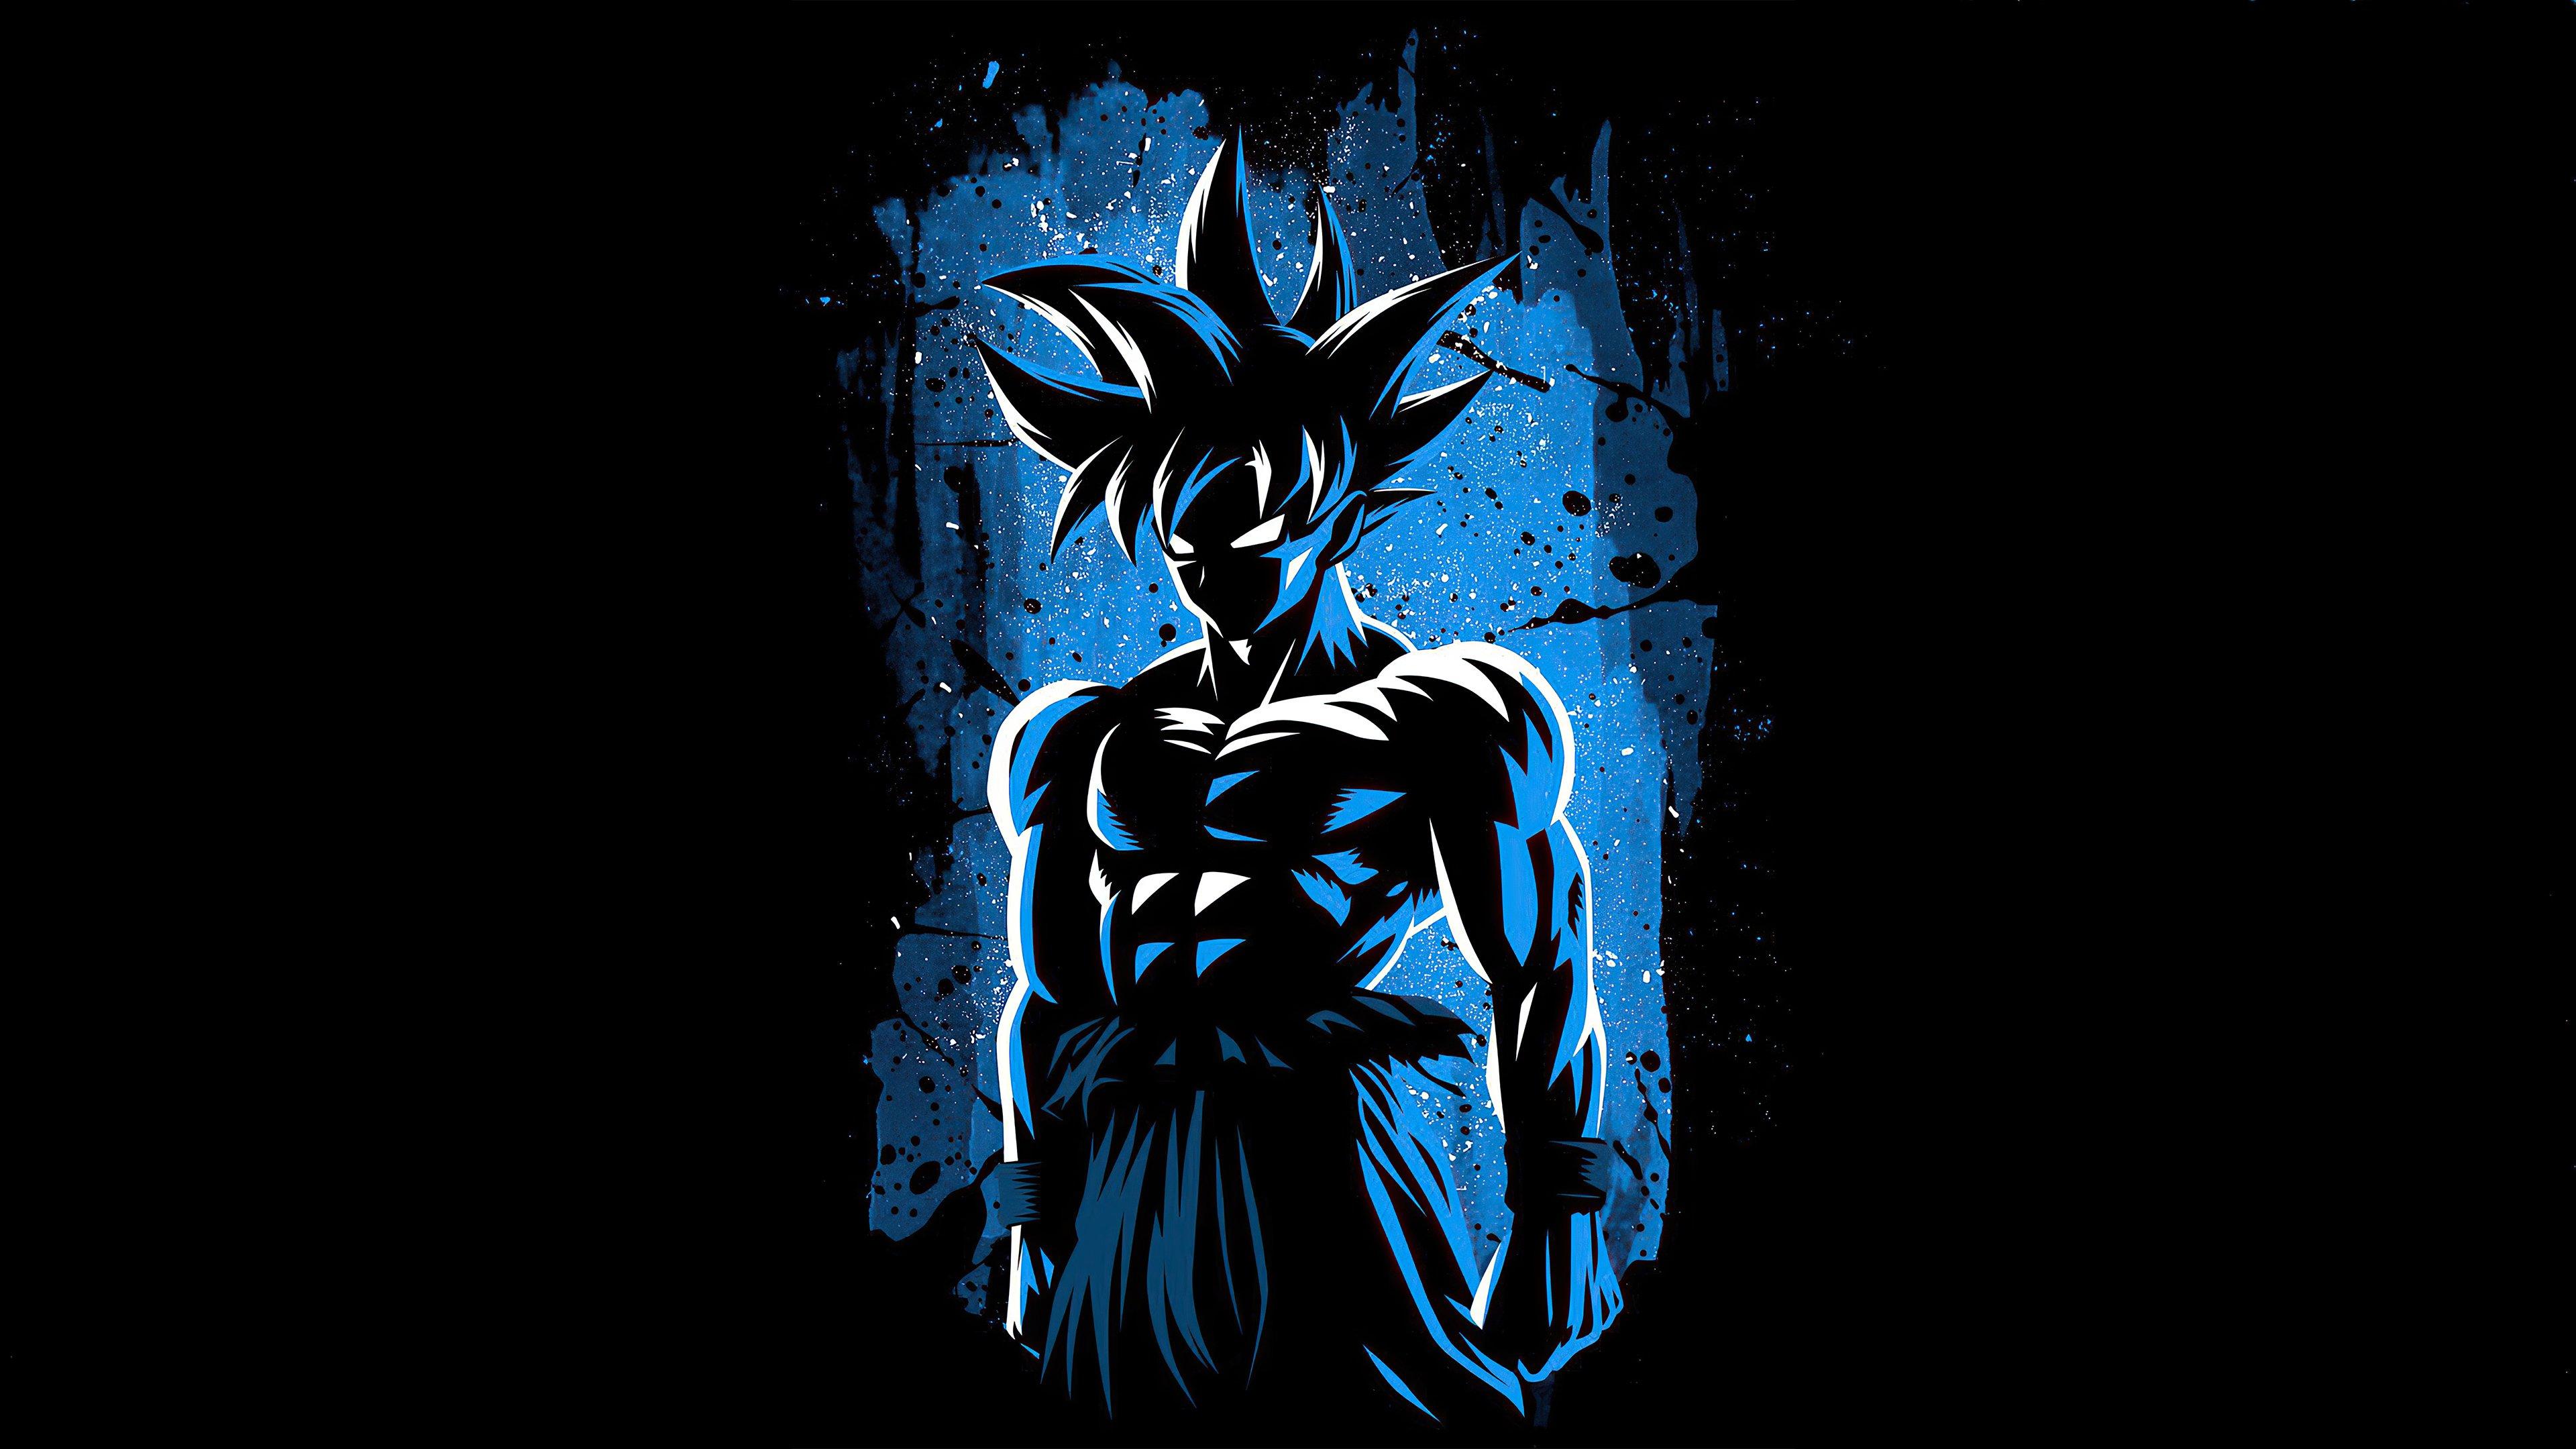 Fondos de pantalla Anime Goku diseño minimalista 2020